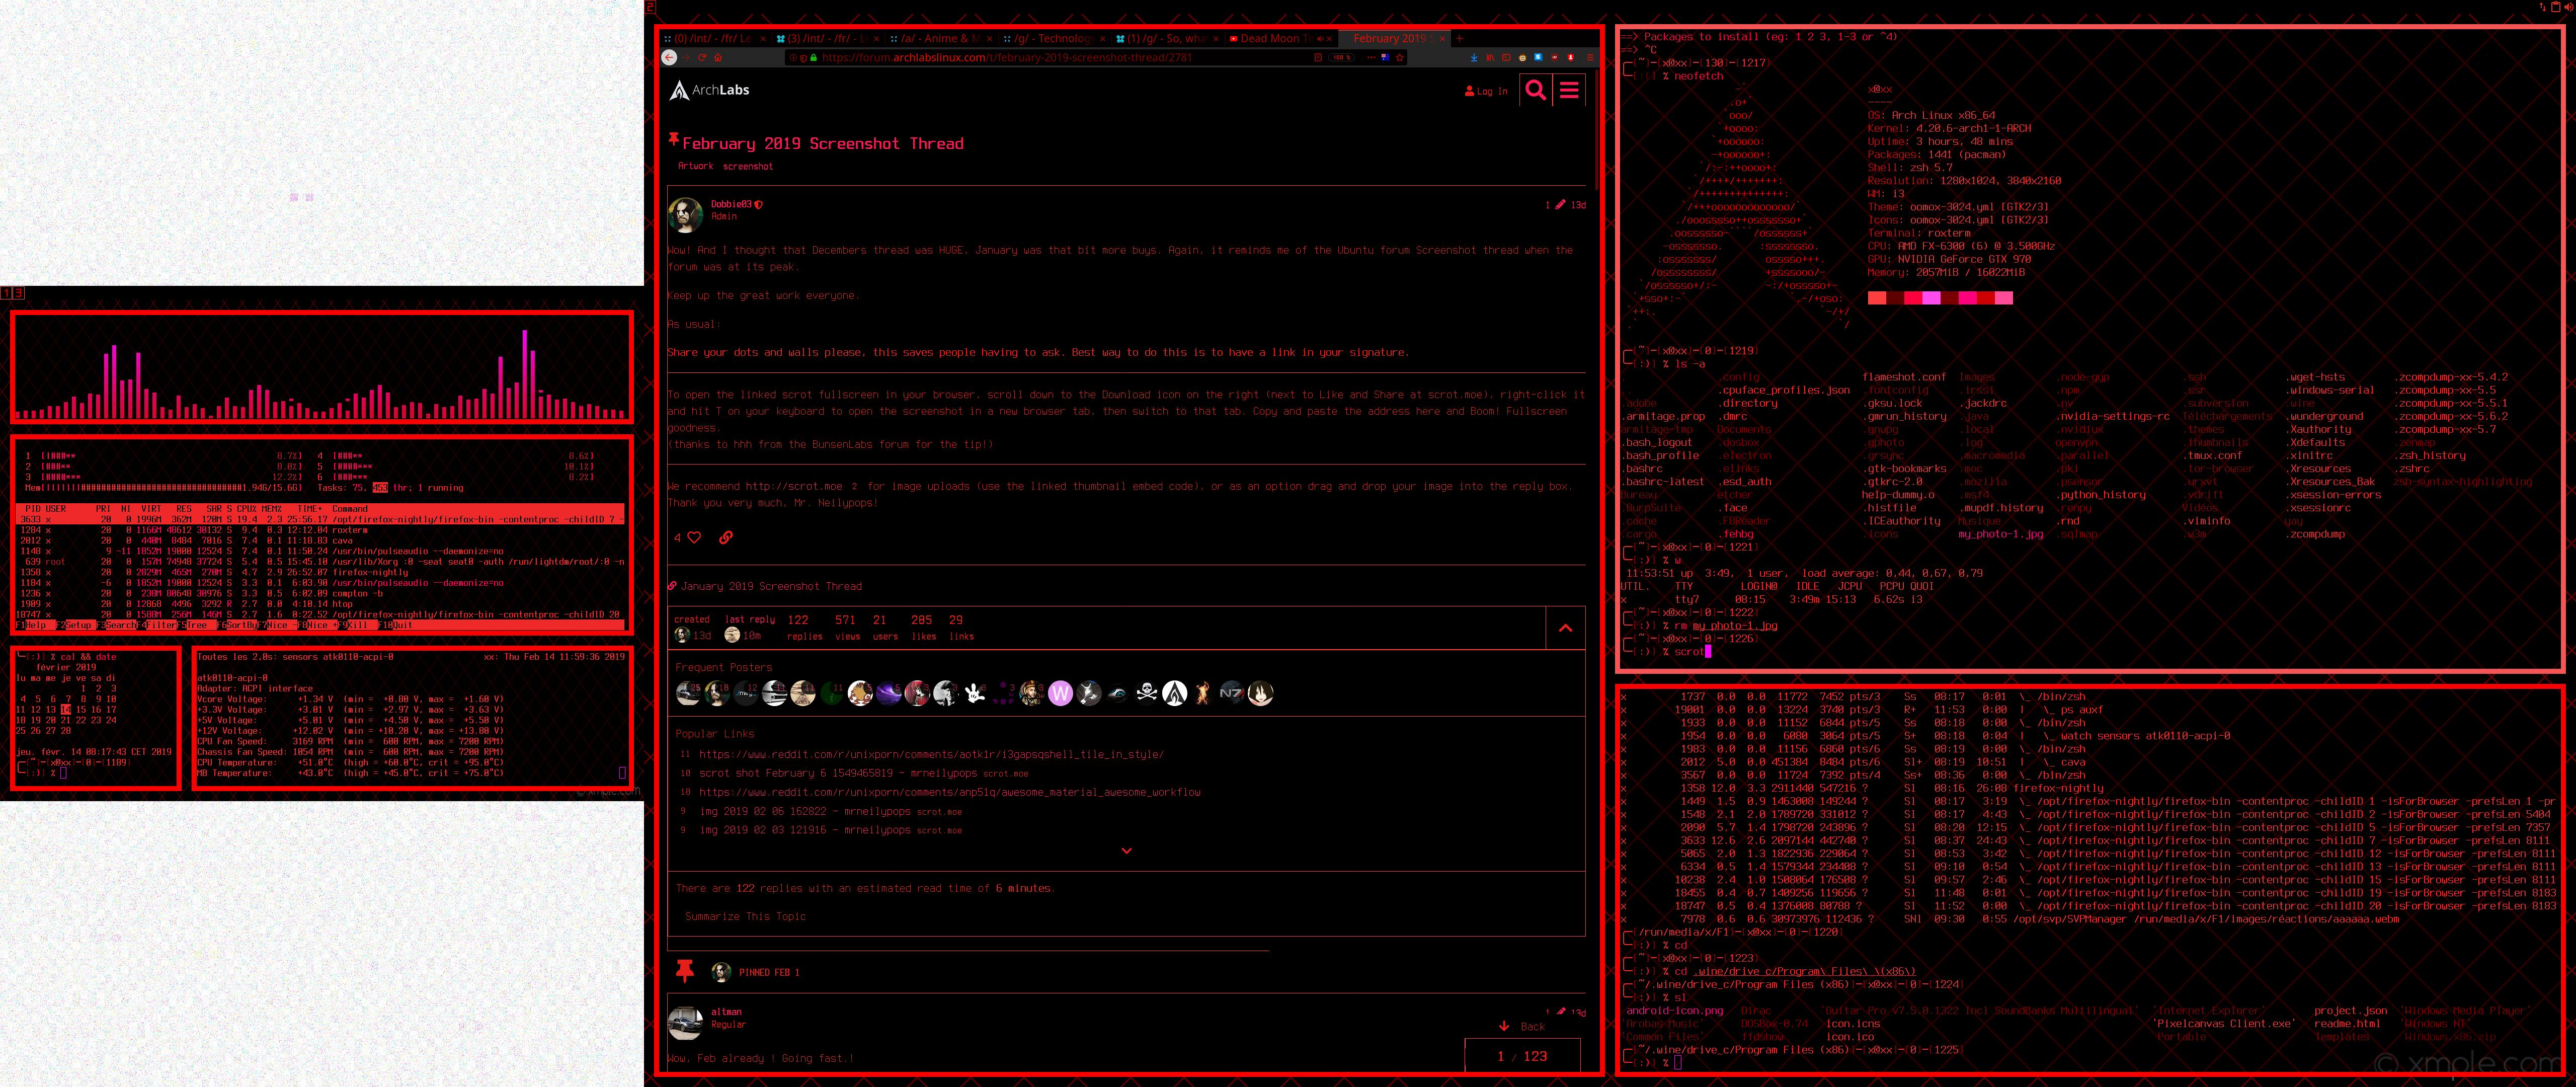 February 2019 Screenshot Thread - Artwork - ArchLabs Linux